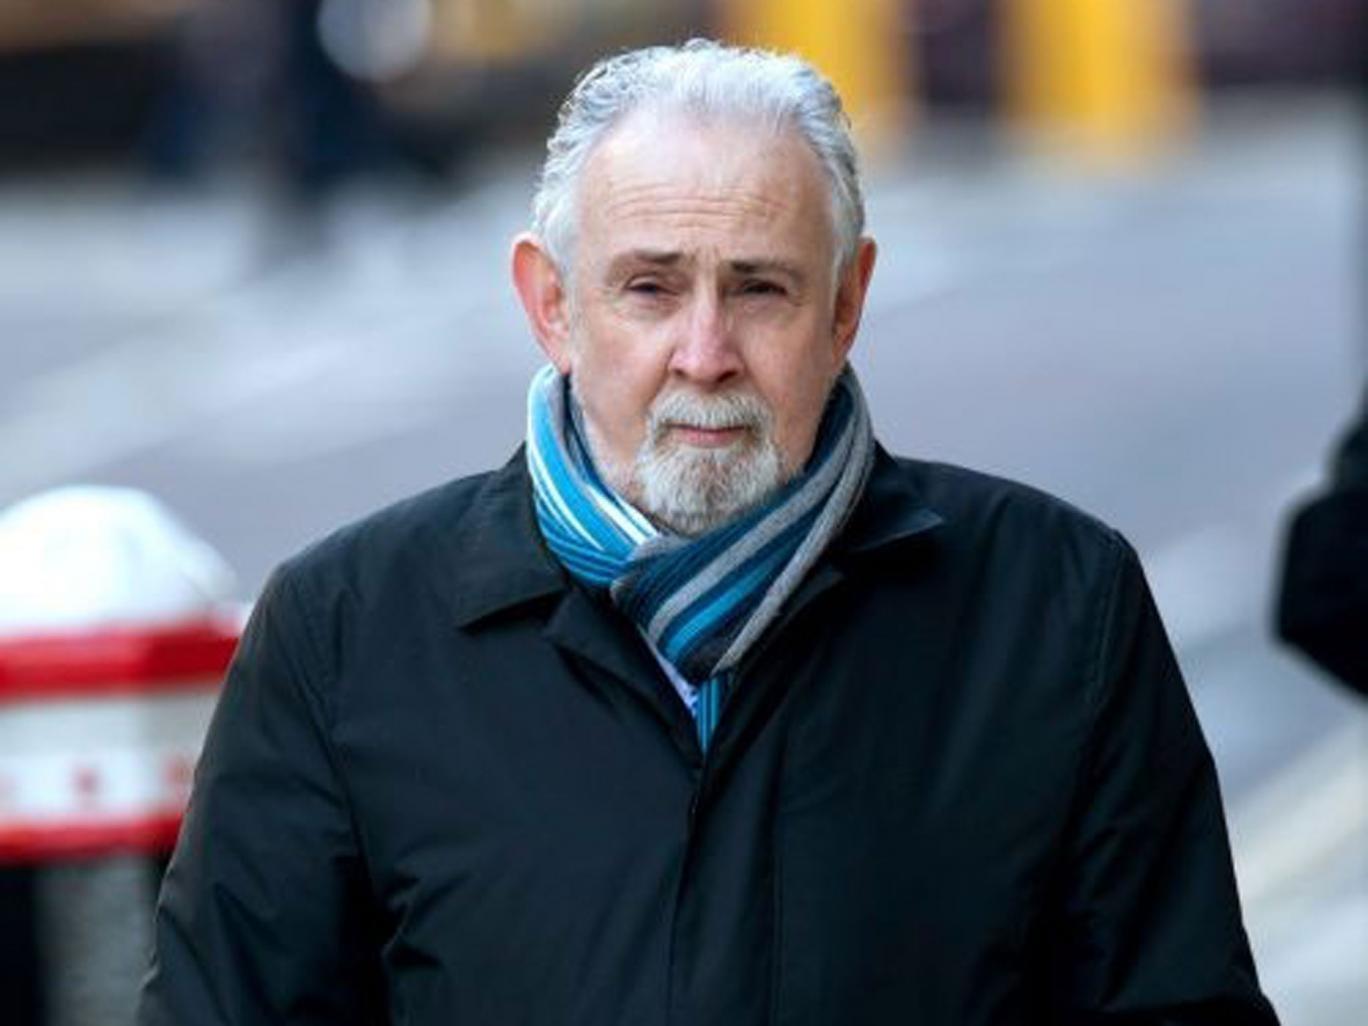 Part of  the process: Former IRA member John Downey